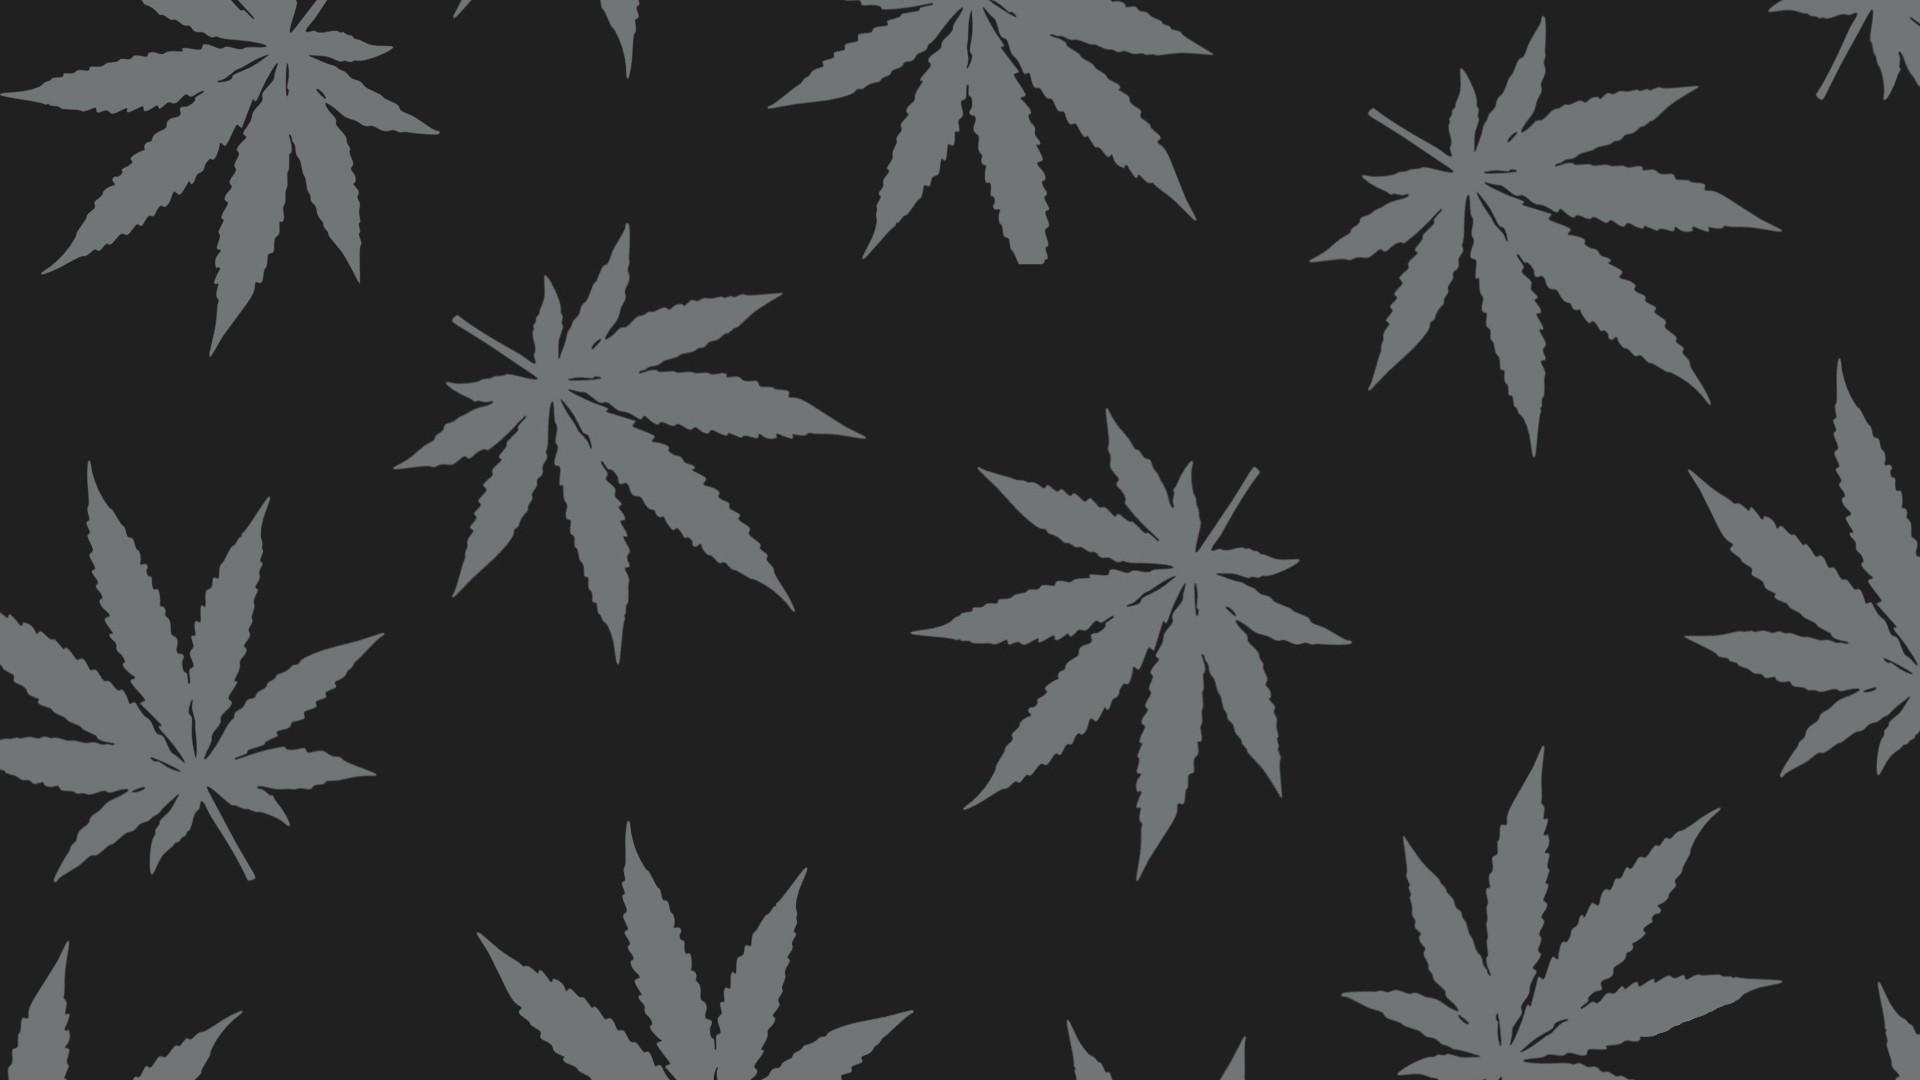 monochrome plants artwork branch symmetry frost pattern cannabis tree leaf plant design black and white monochrome photography land plant flowering plant maple tree maple leaf 339790